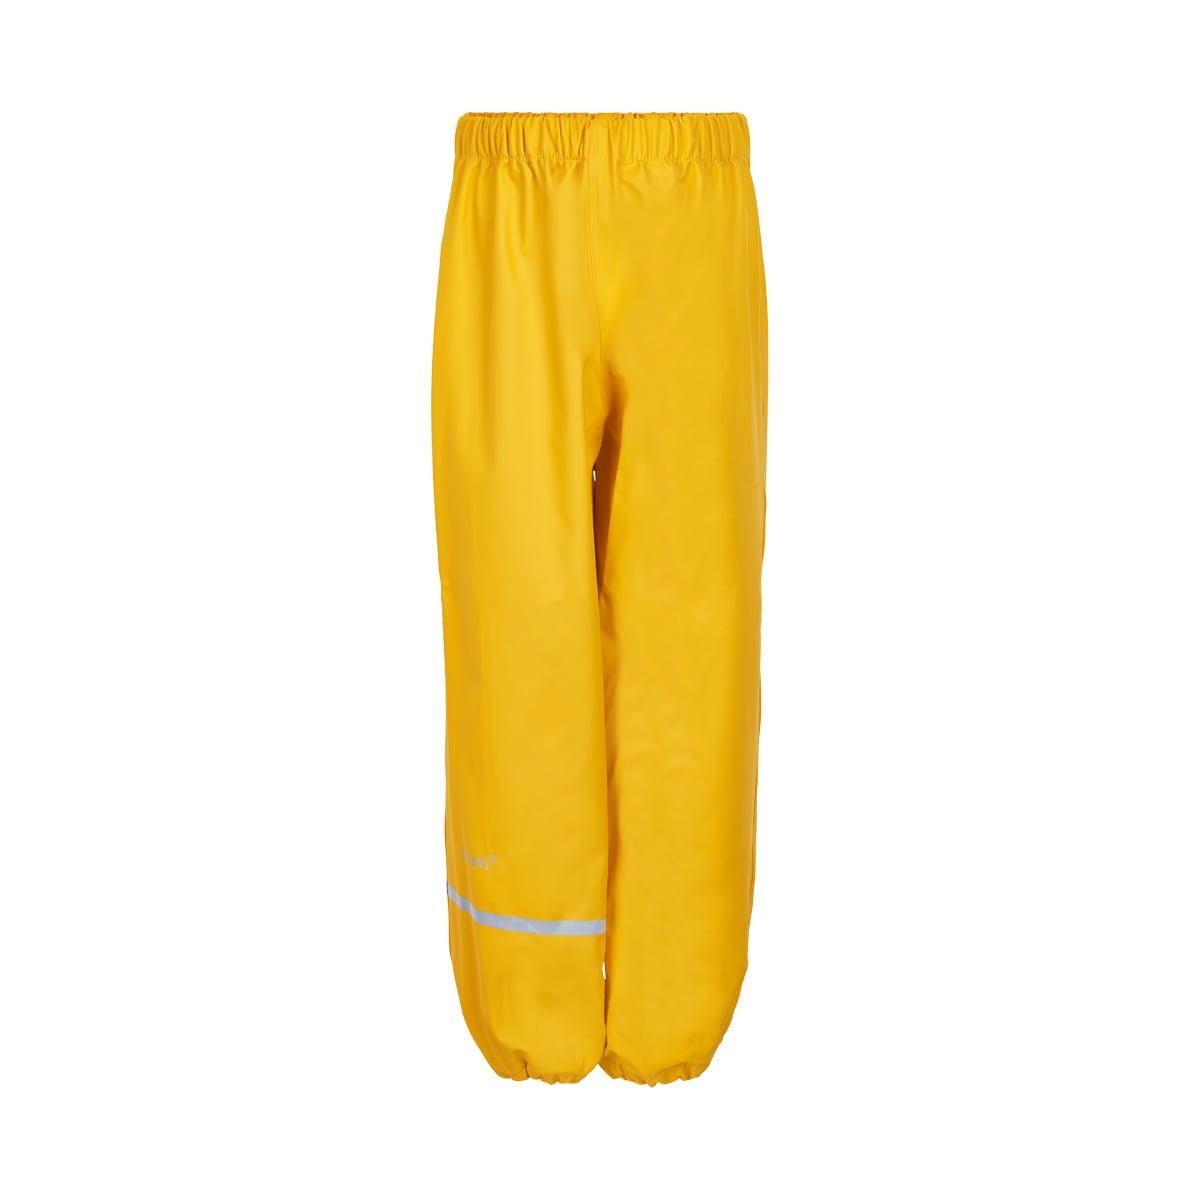 Pantaloni de ploaie și vânt (impermeabil) yellow CeLaVi 1